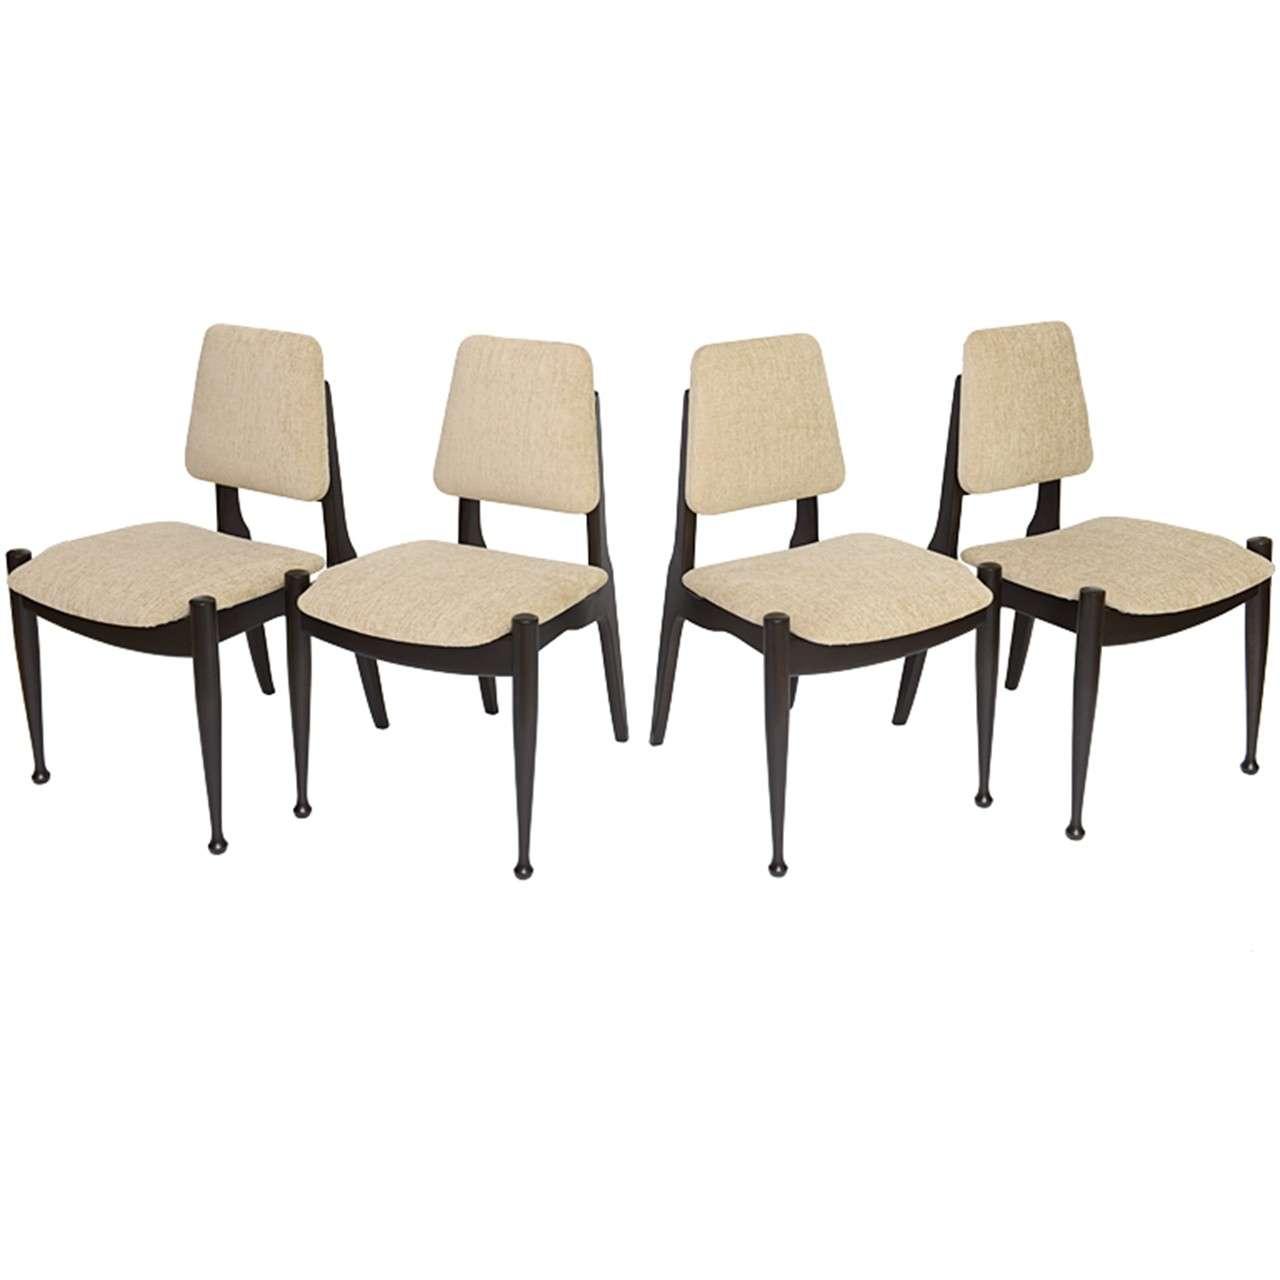 Four greta grossman style ebonized 50s modern dining for Dining room chairs 50